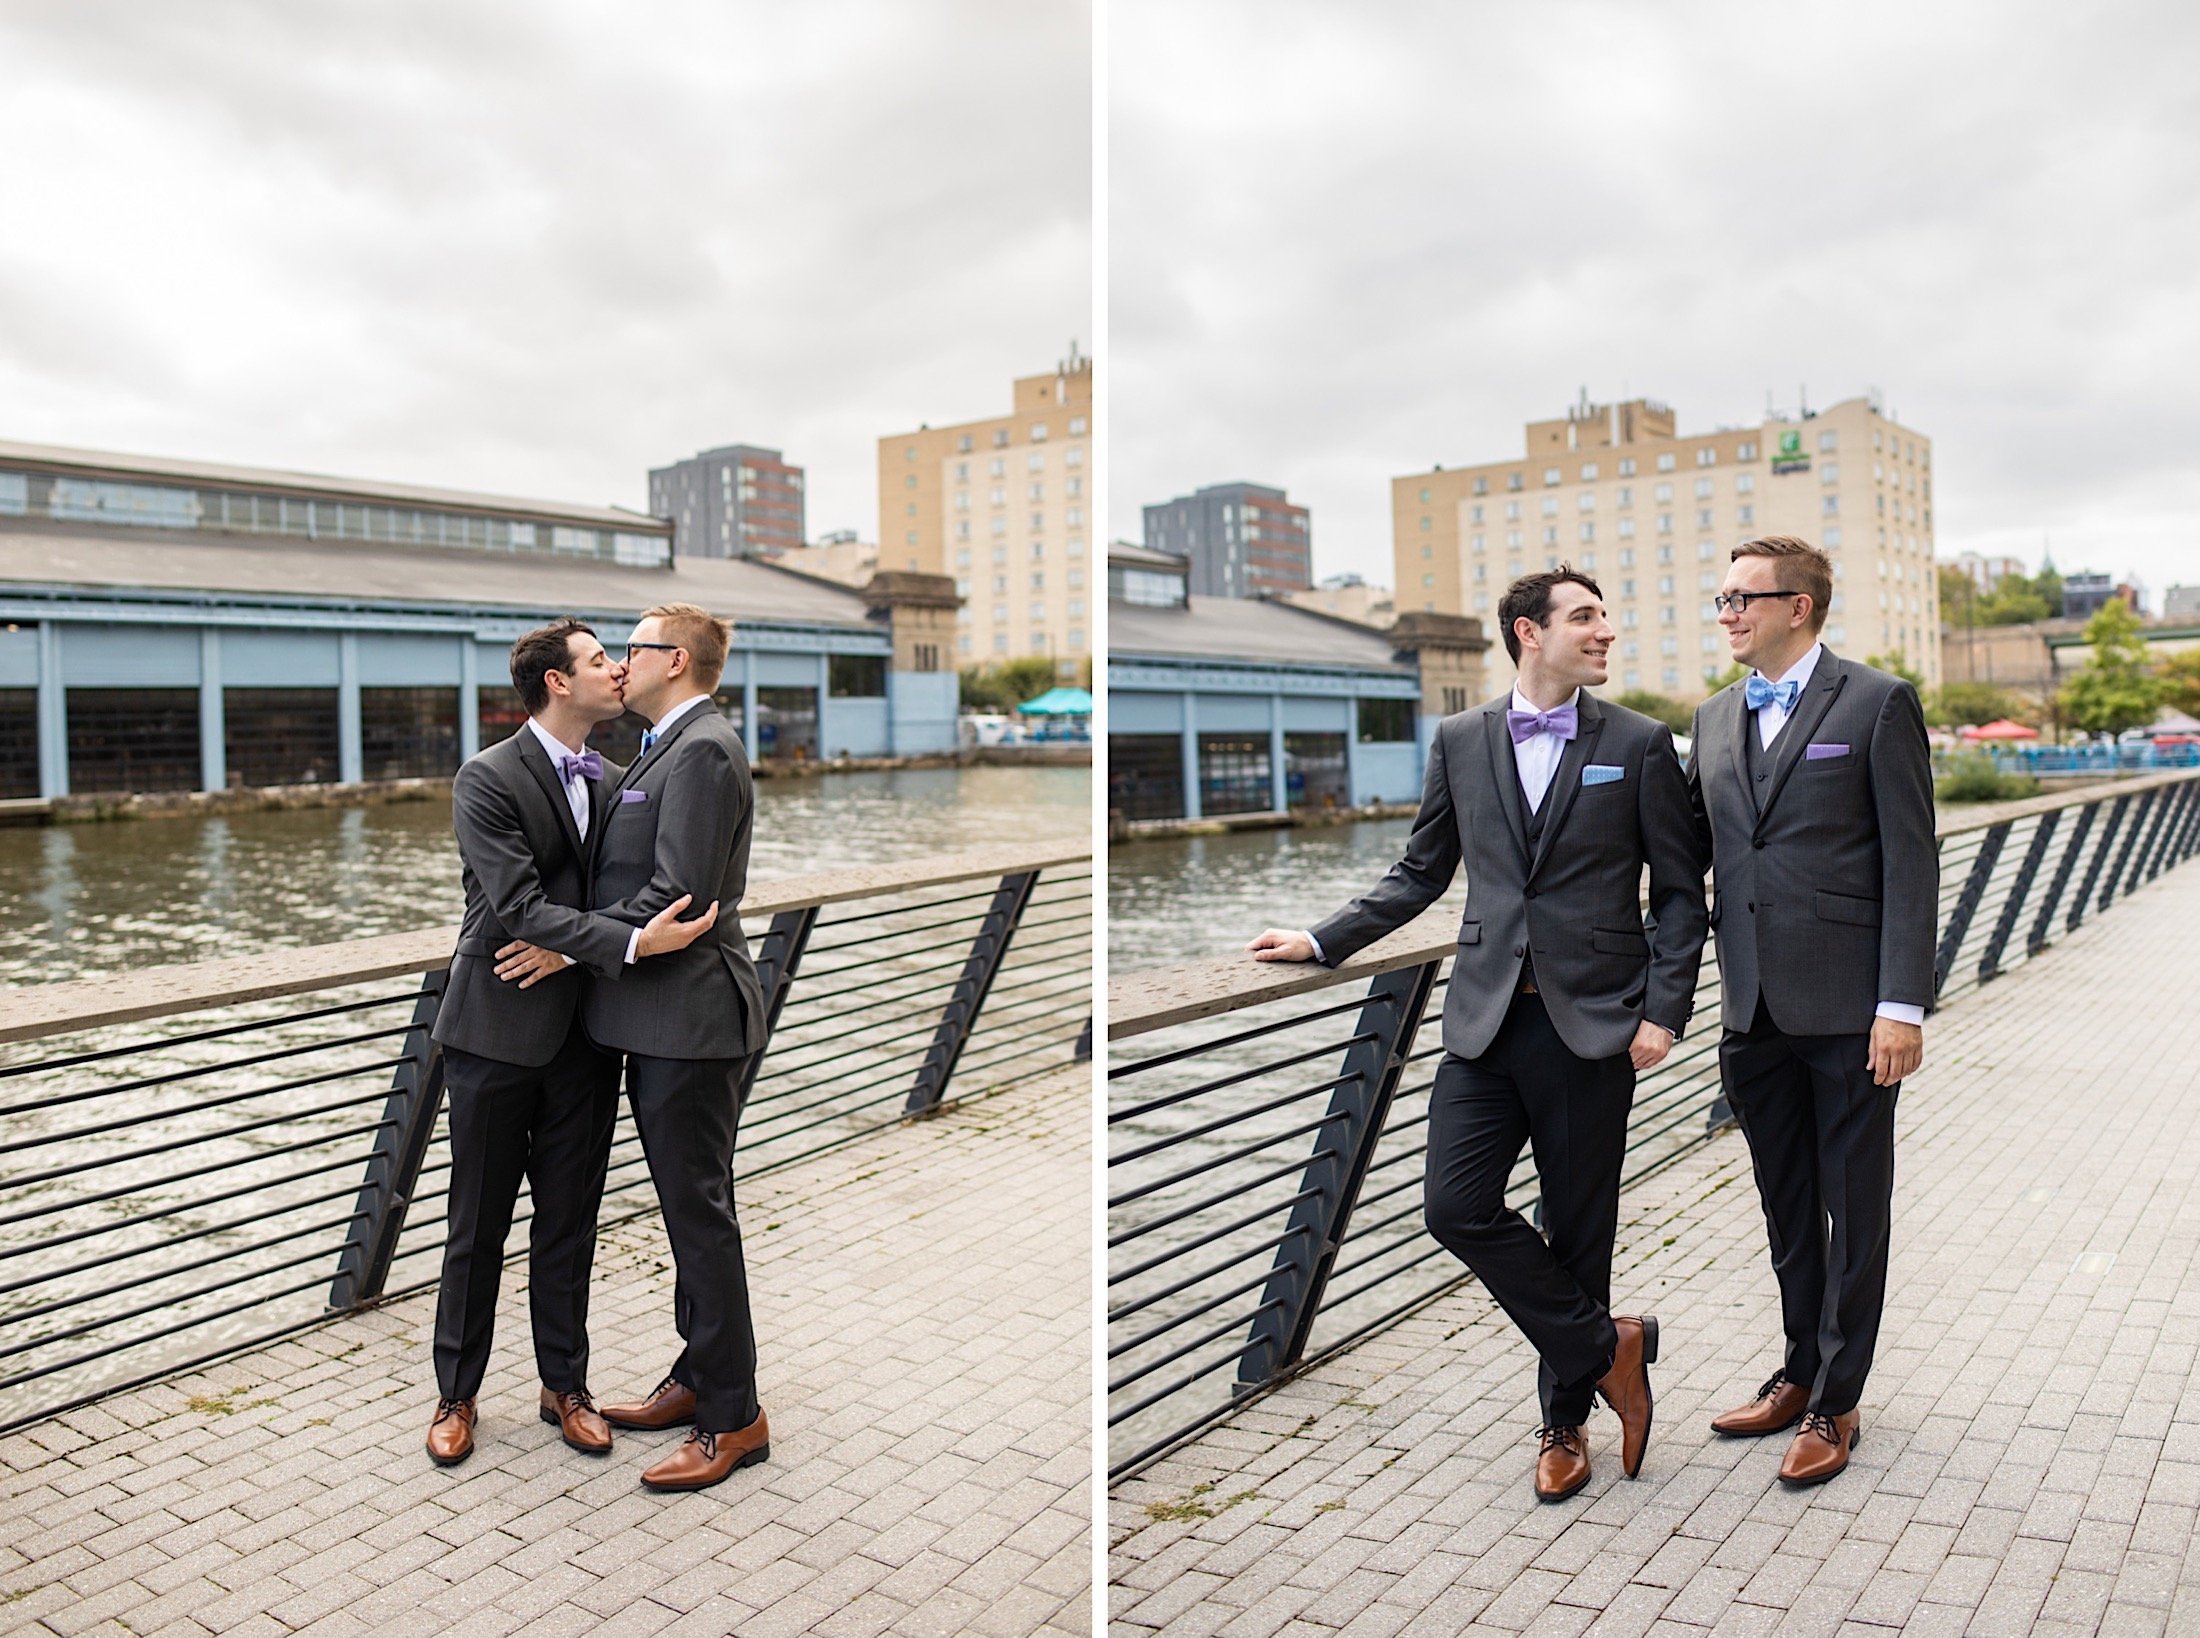 LGBTQ Philadelphia wedding photographer, inclusive